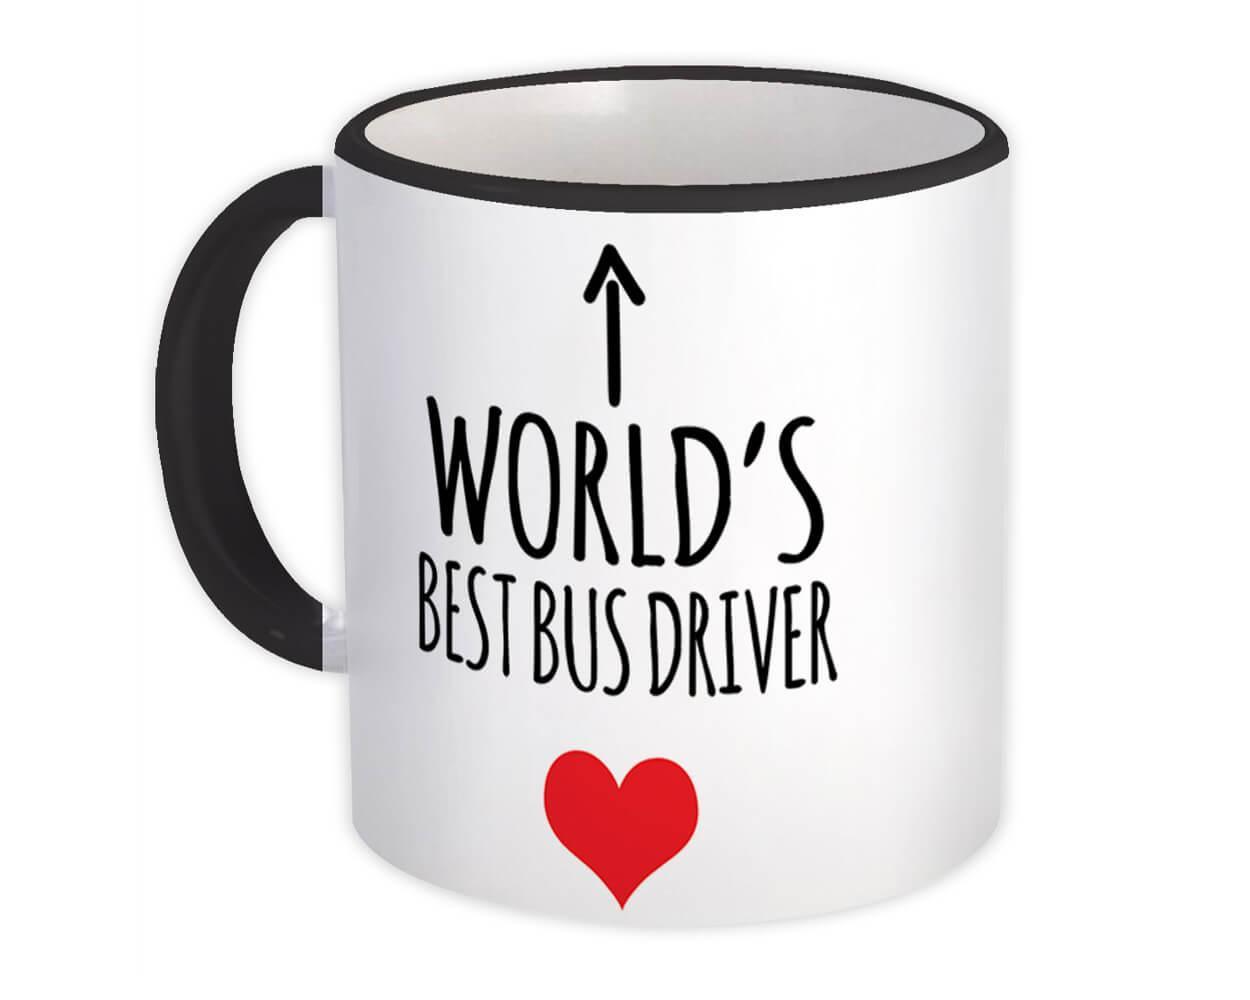 Worlds Best BUS DRIVER : Gift Mug Heart Love Family Work Christmas Birthday